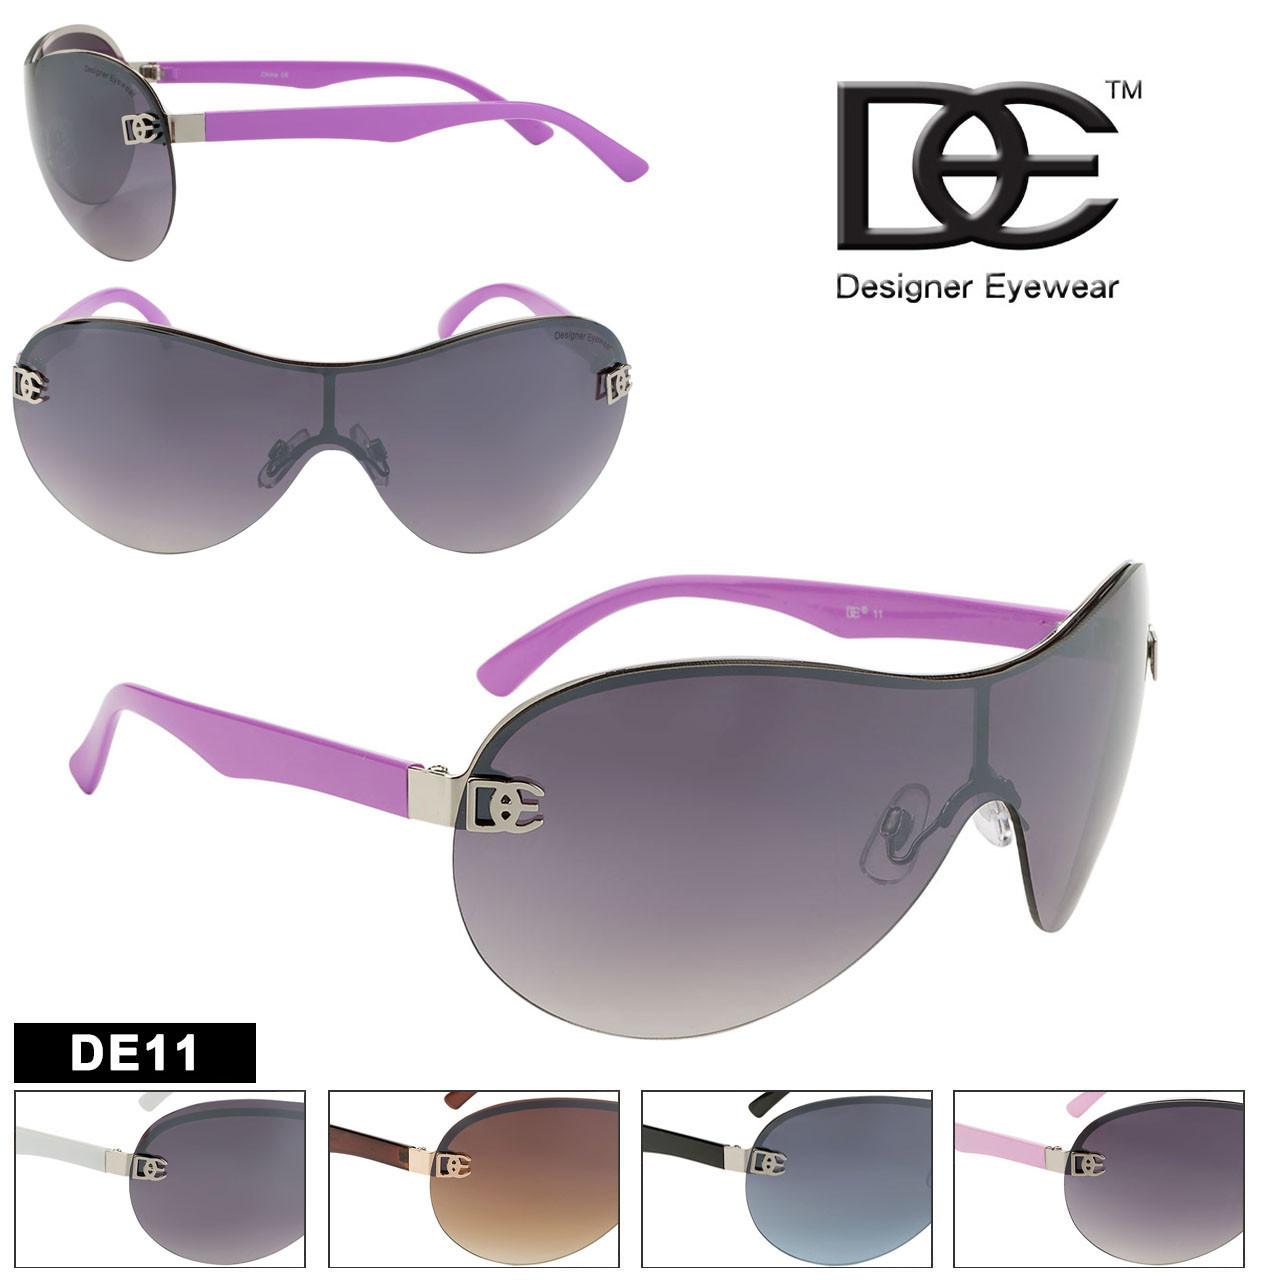 DE™ Designer Eyewear Sunglasses ~ Style #DE11 Single Piece Lens (Assorted Colors) (12 pcs.)